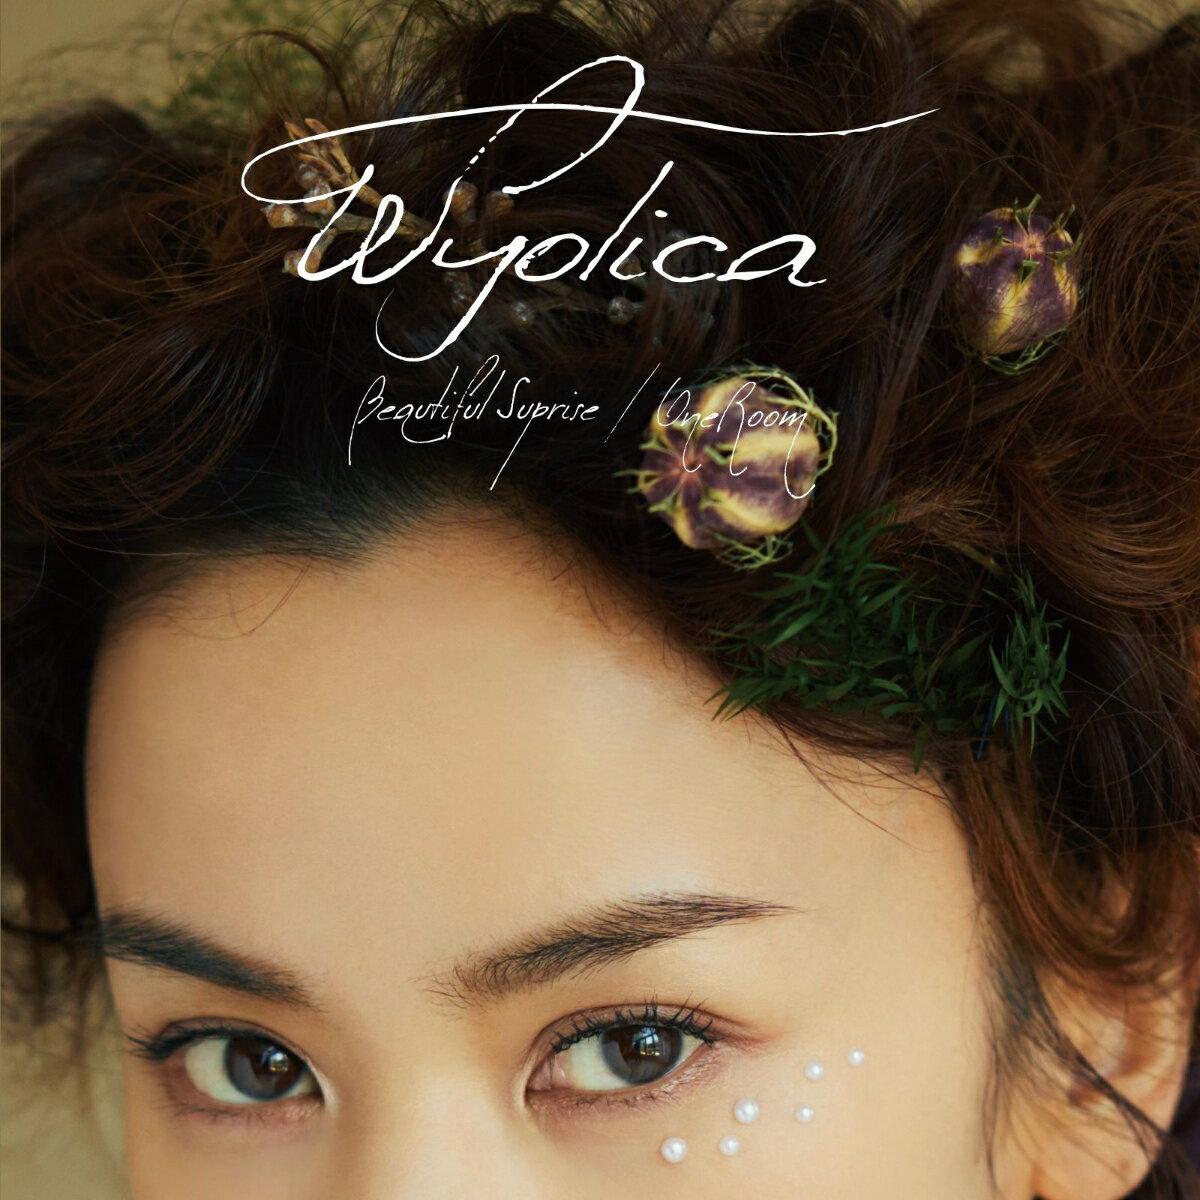 Beautiful Surprise/OneRoom(完全生産限定)【アナログ盤】画像